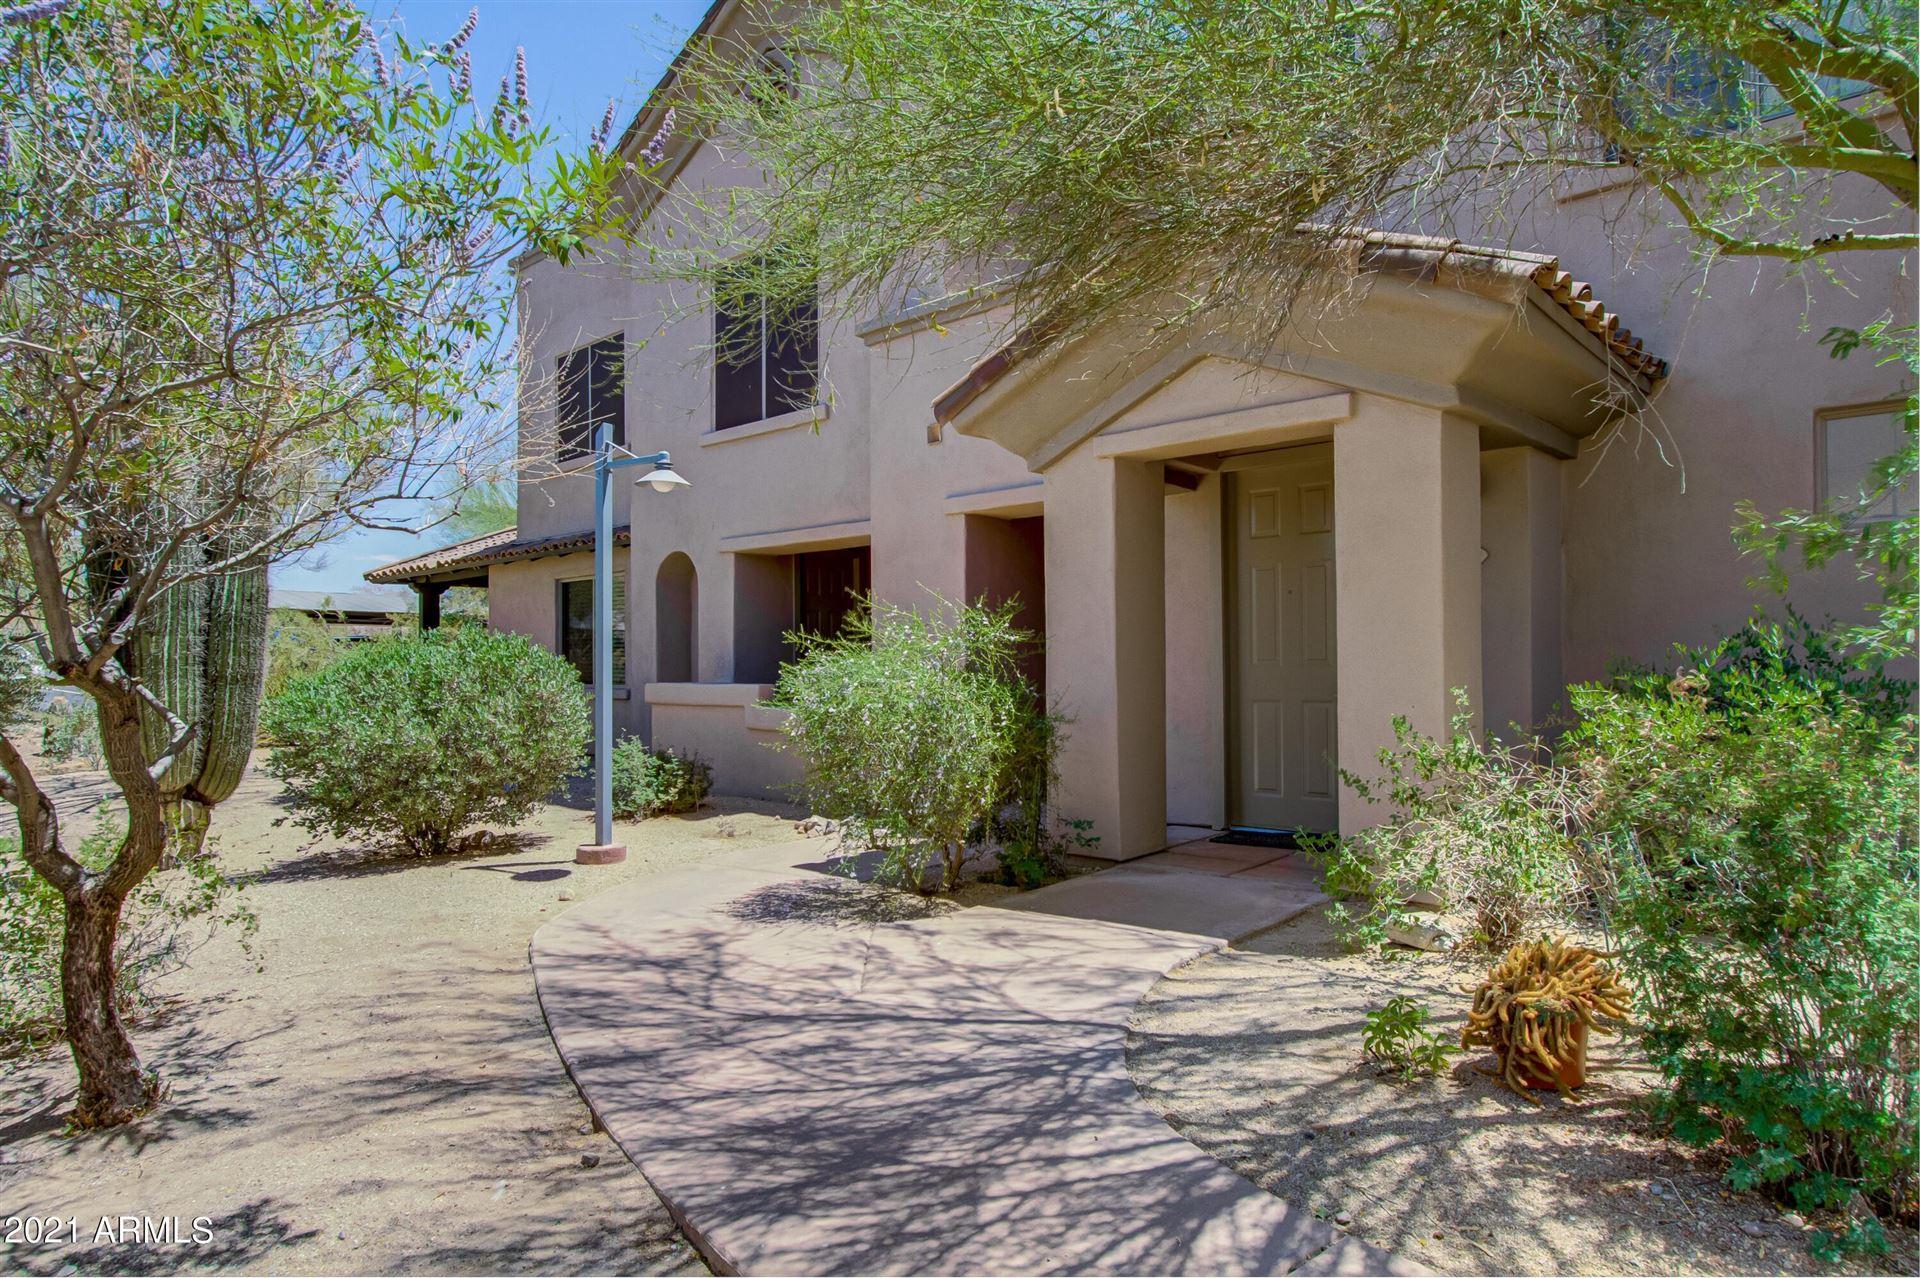 Photo of 20801 N 90TH Place N #202, Scottsdale, AZ 85255 (MLS # 6238203)